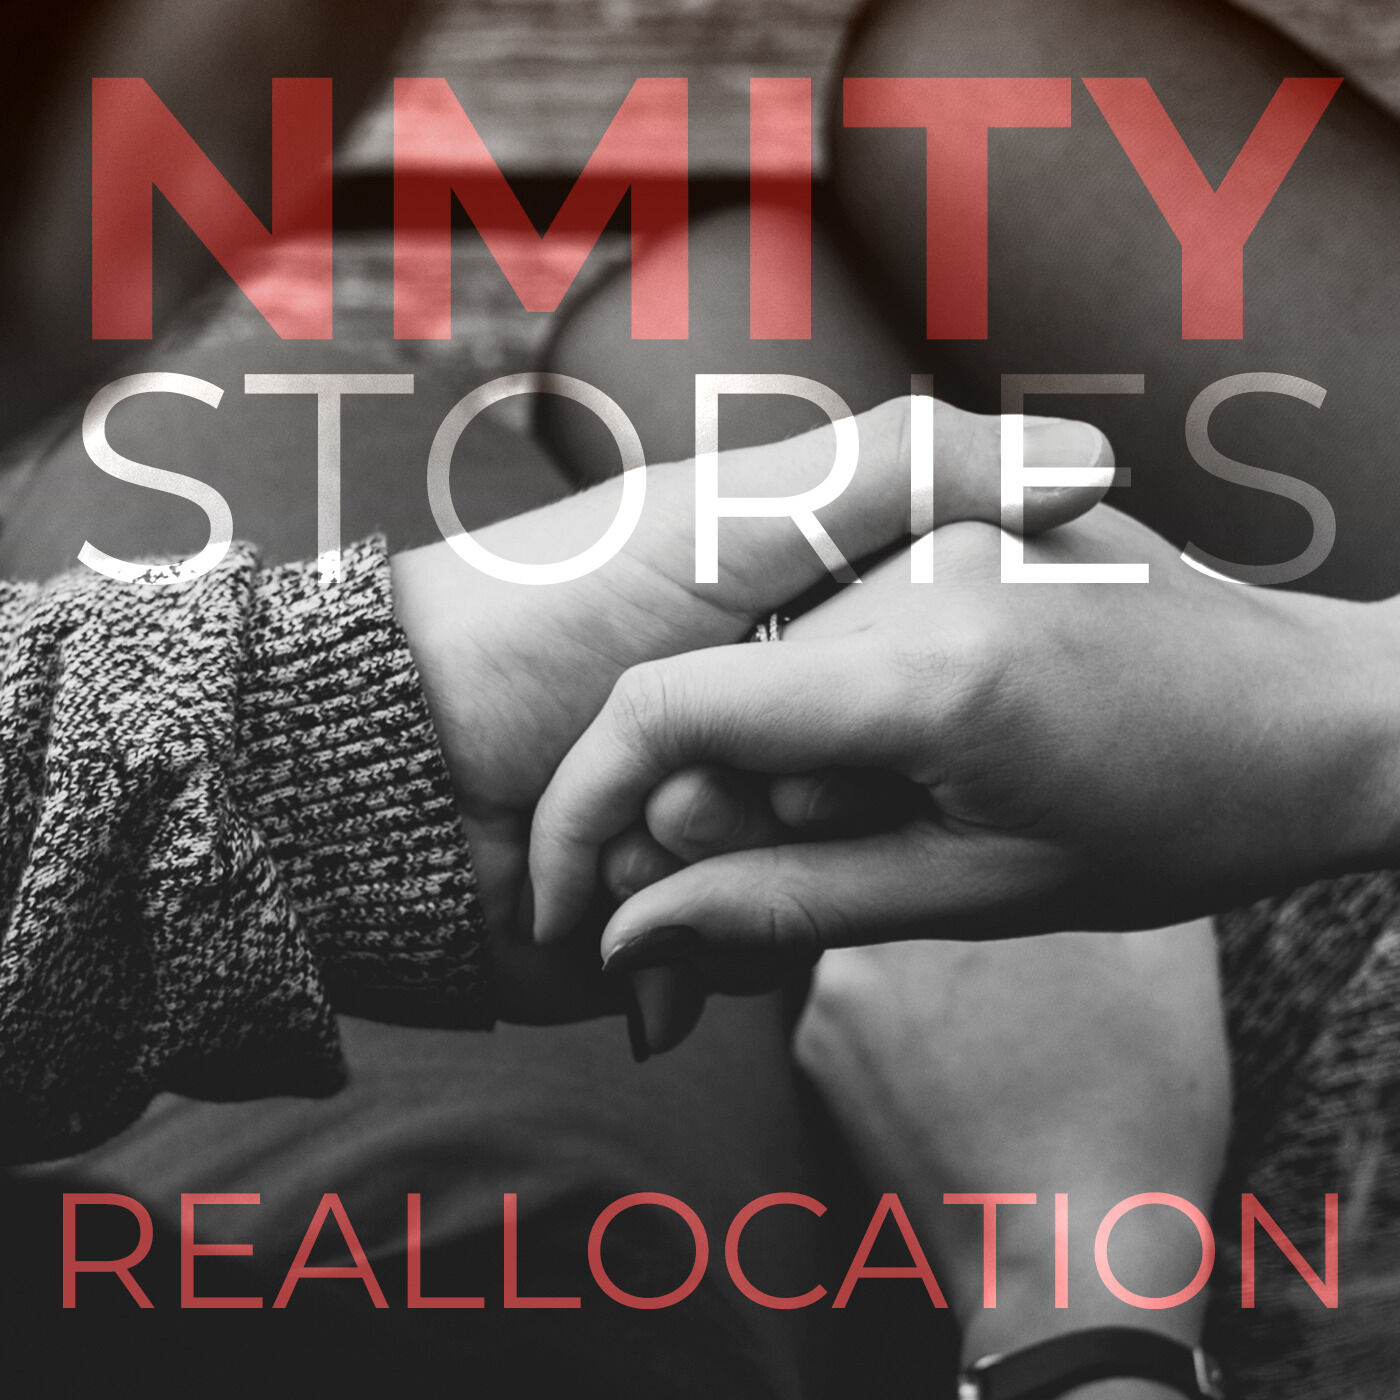 Reallocation